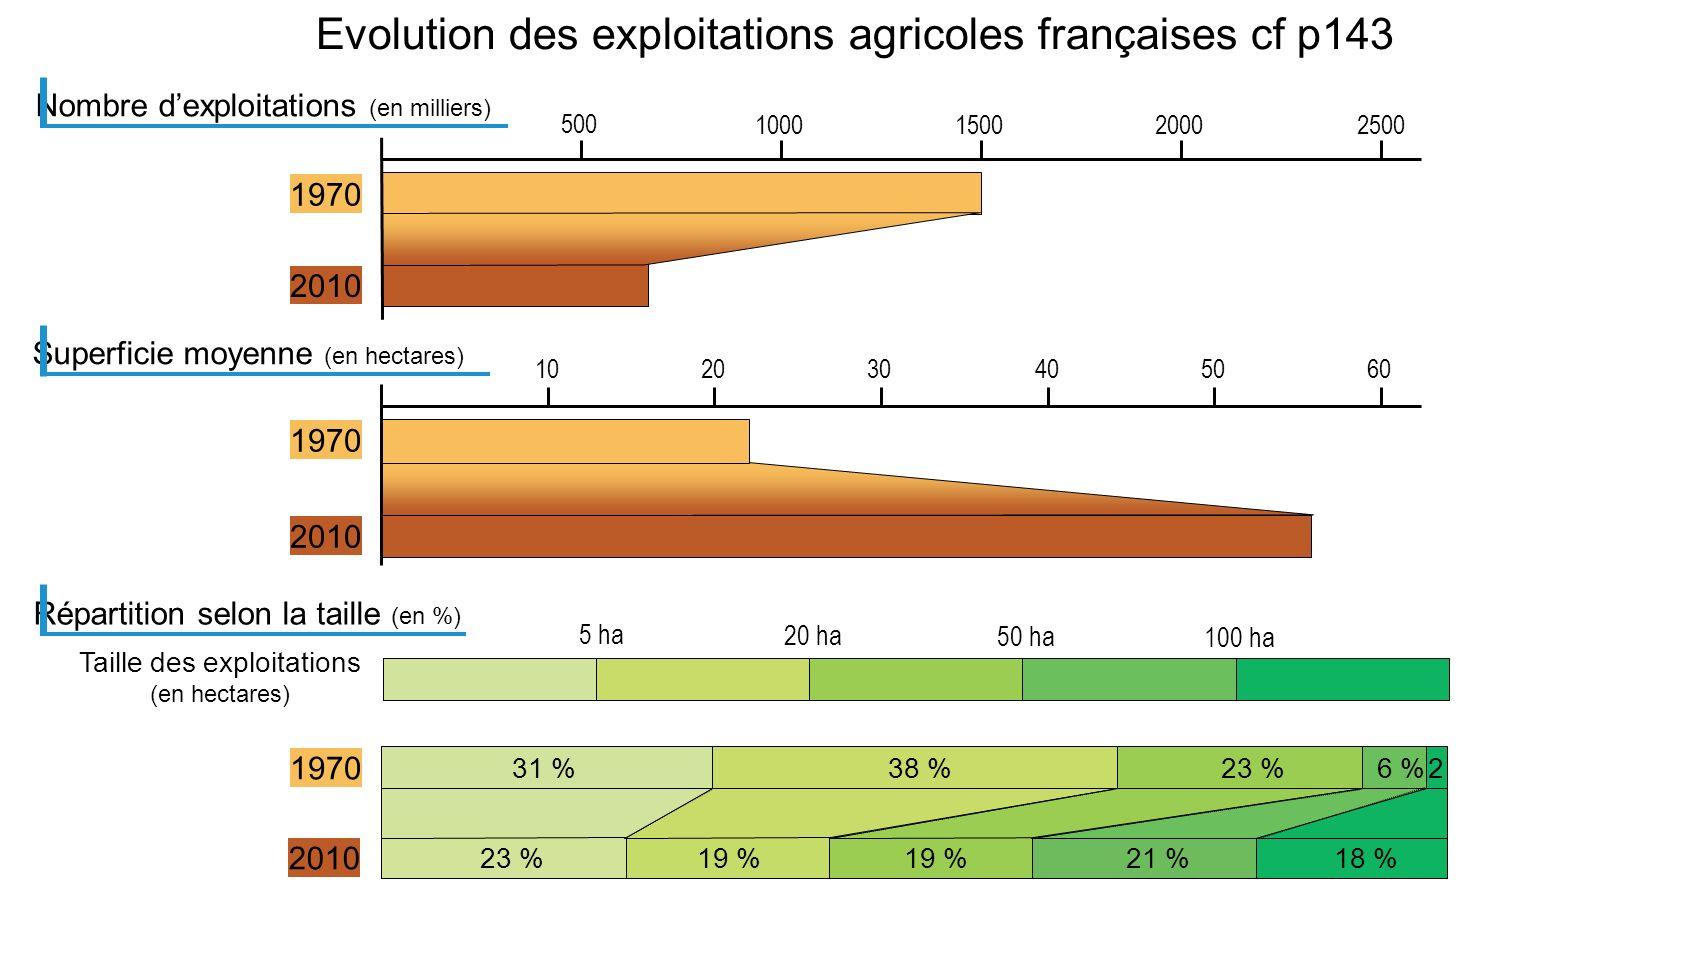 Taille des exploitations (en hectares) 5 ha 20 ha 50 ha 100 ha Evolution des exploitations agricoles françaises cf p143 500 1000150020002500 Nombre de